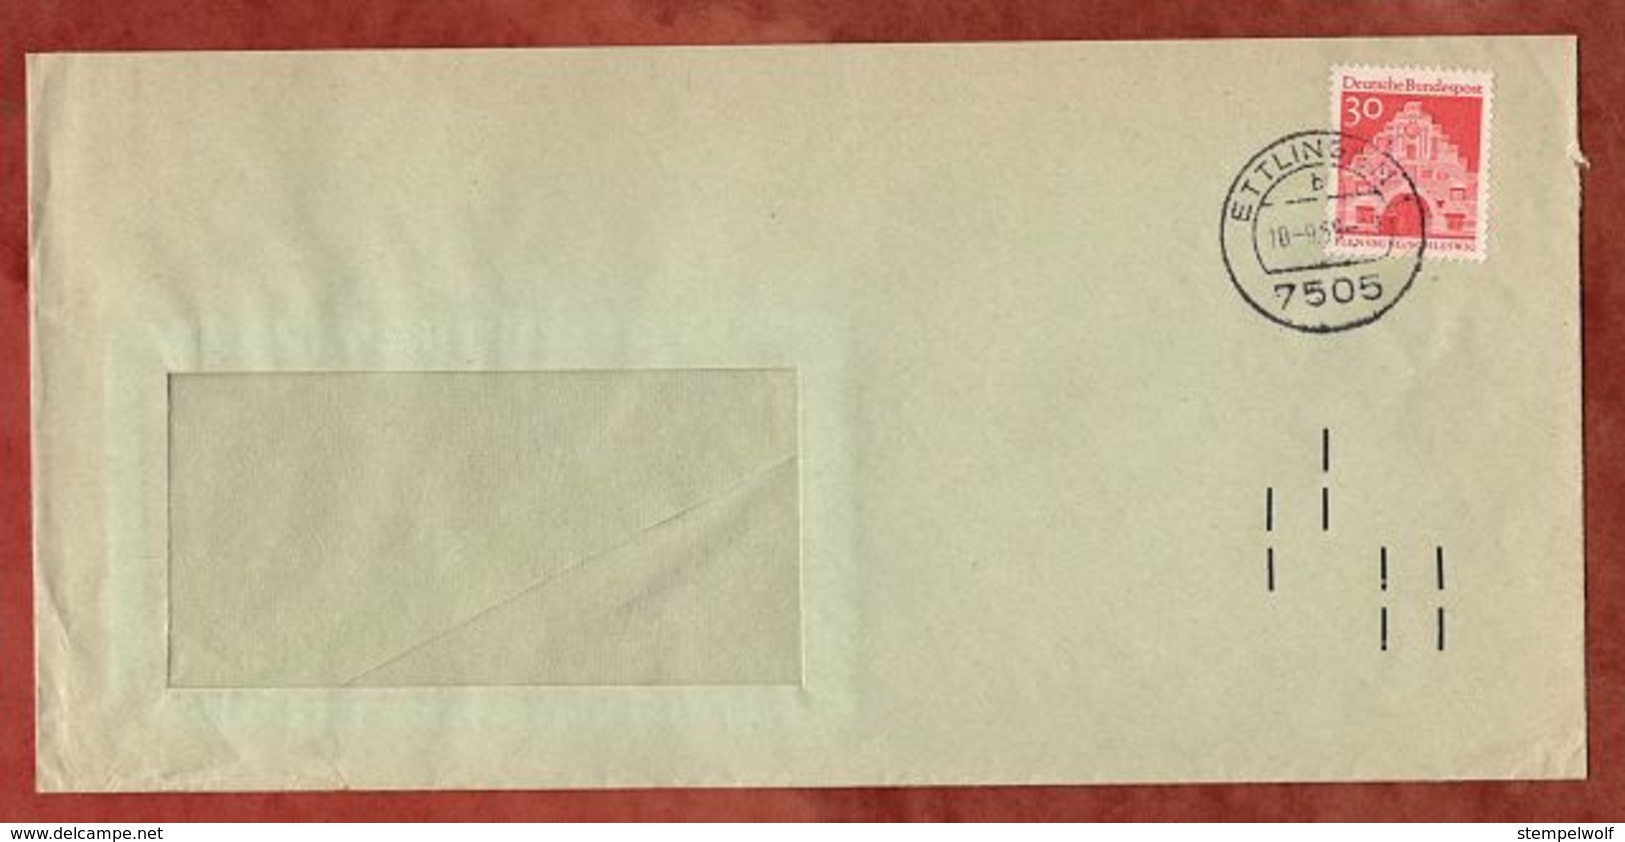 Brief, Flensburg, Ettlingen 1965 (74745) - Covers & Documents